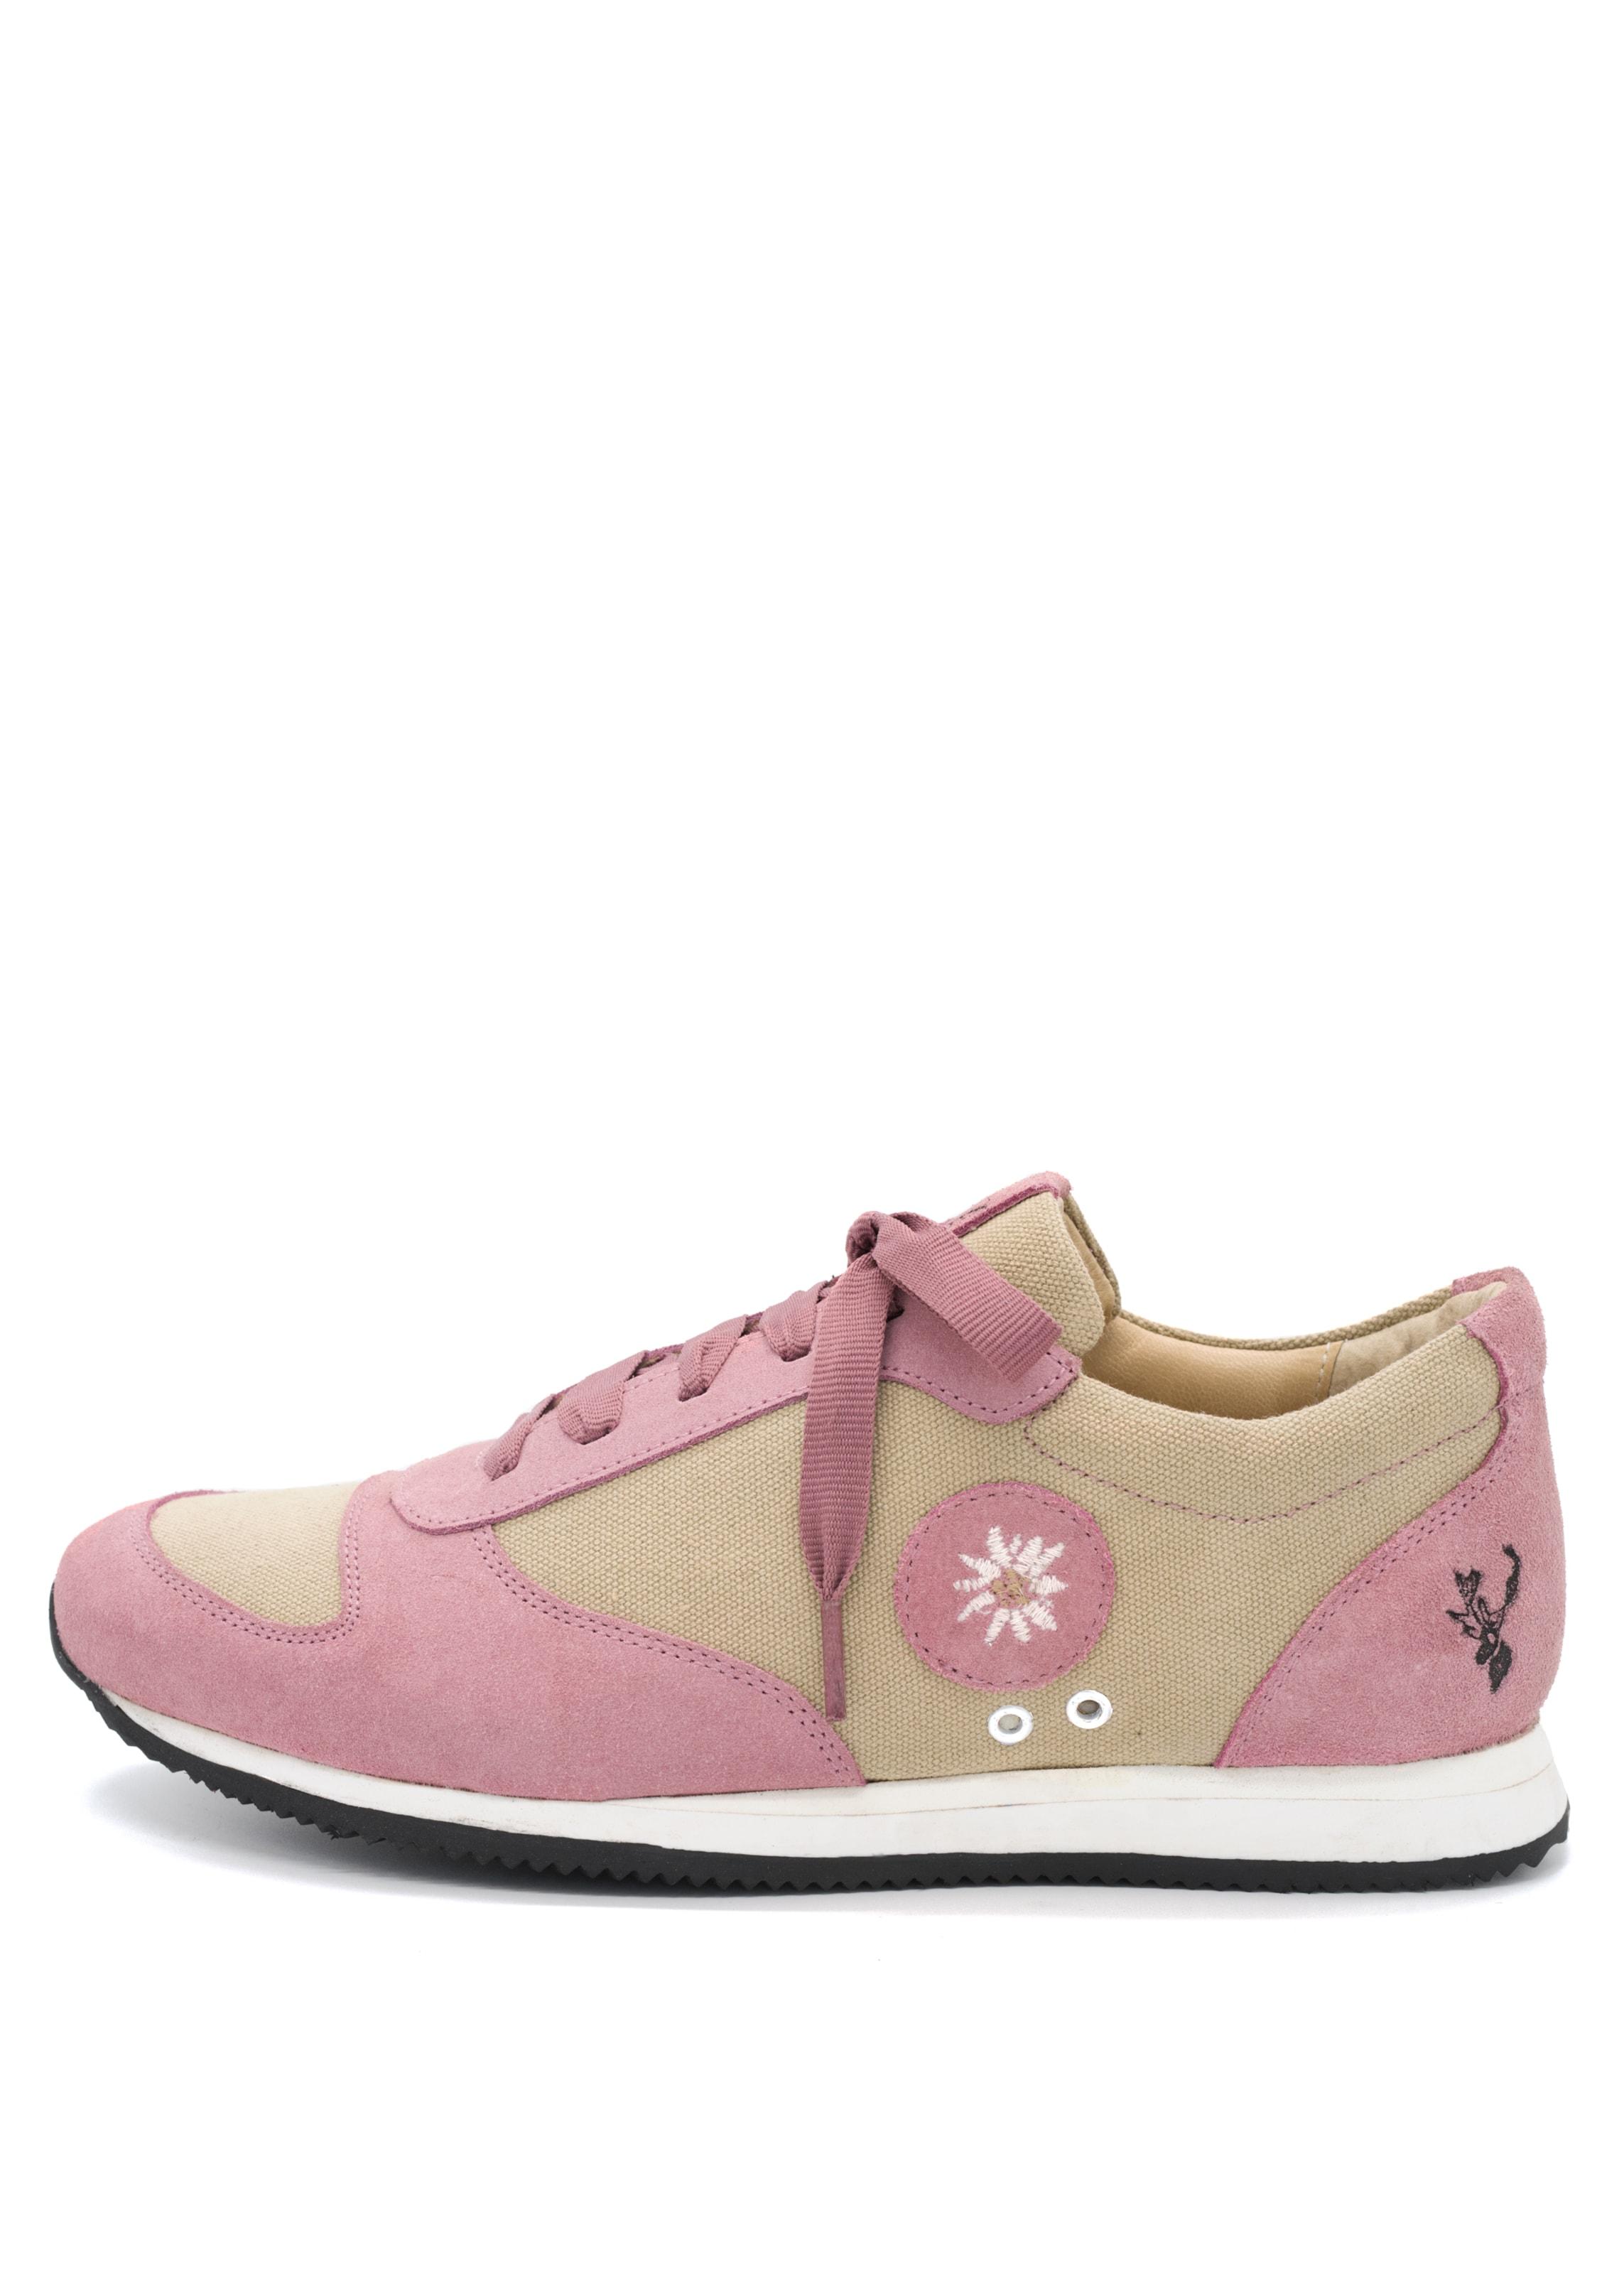 'lola' BeigeRosa Sneaker Spiethamp; Wensky In UMVqpzSG